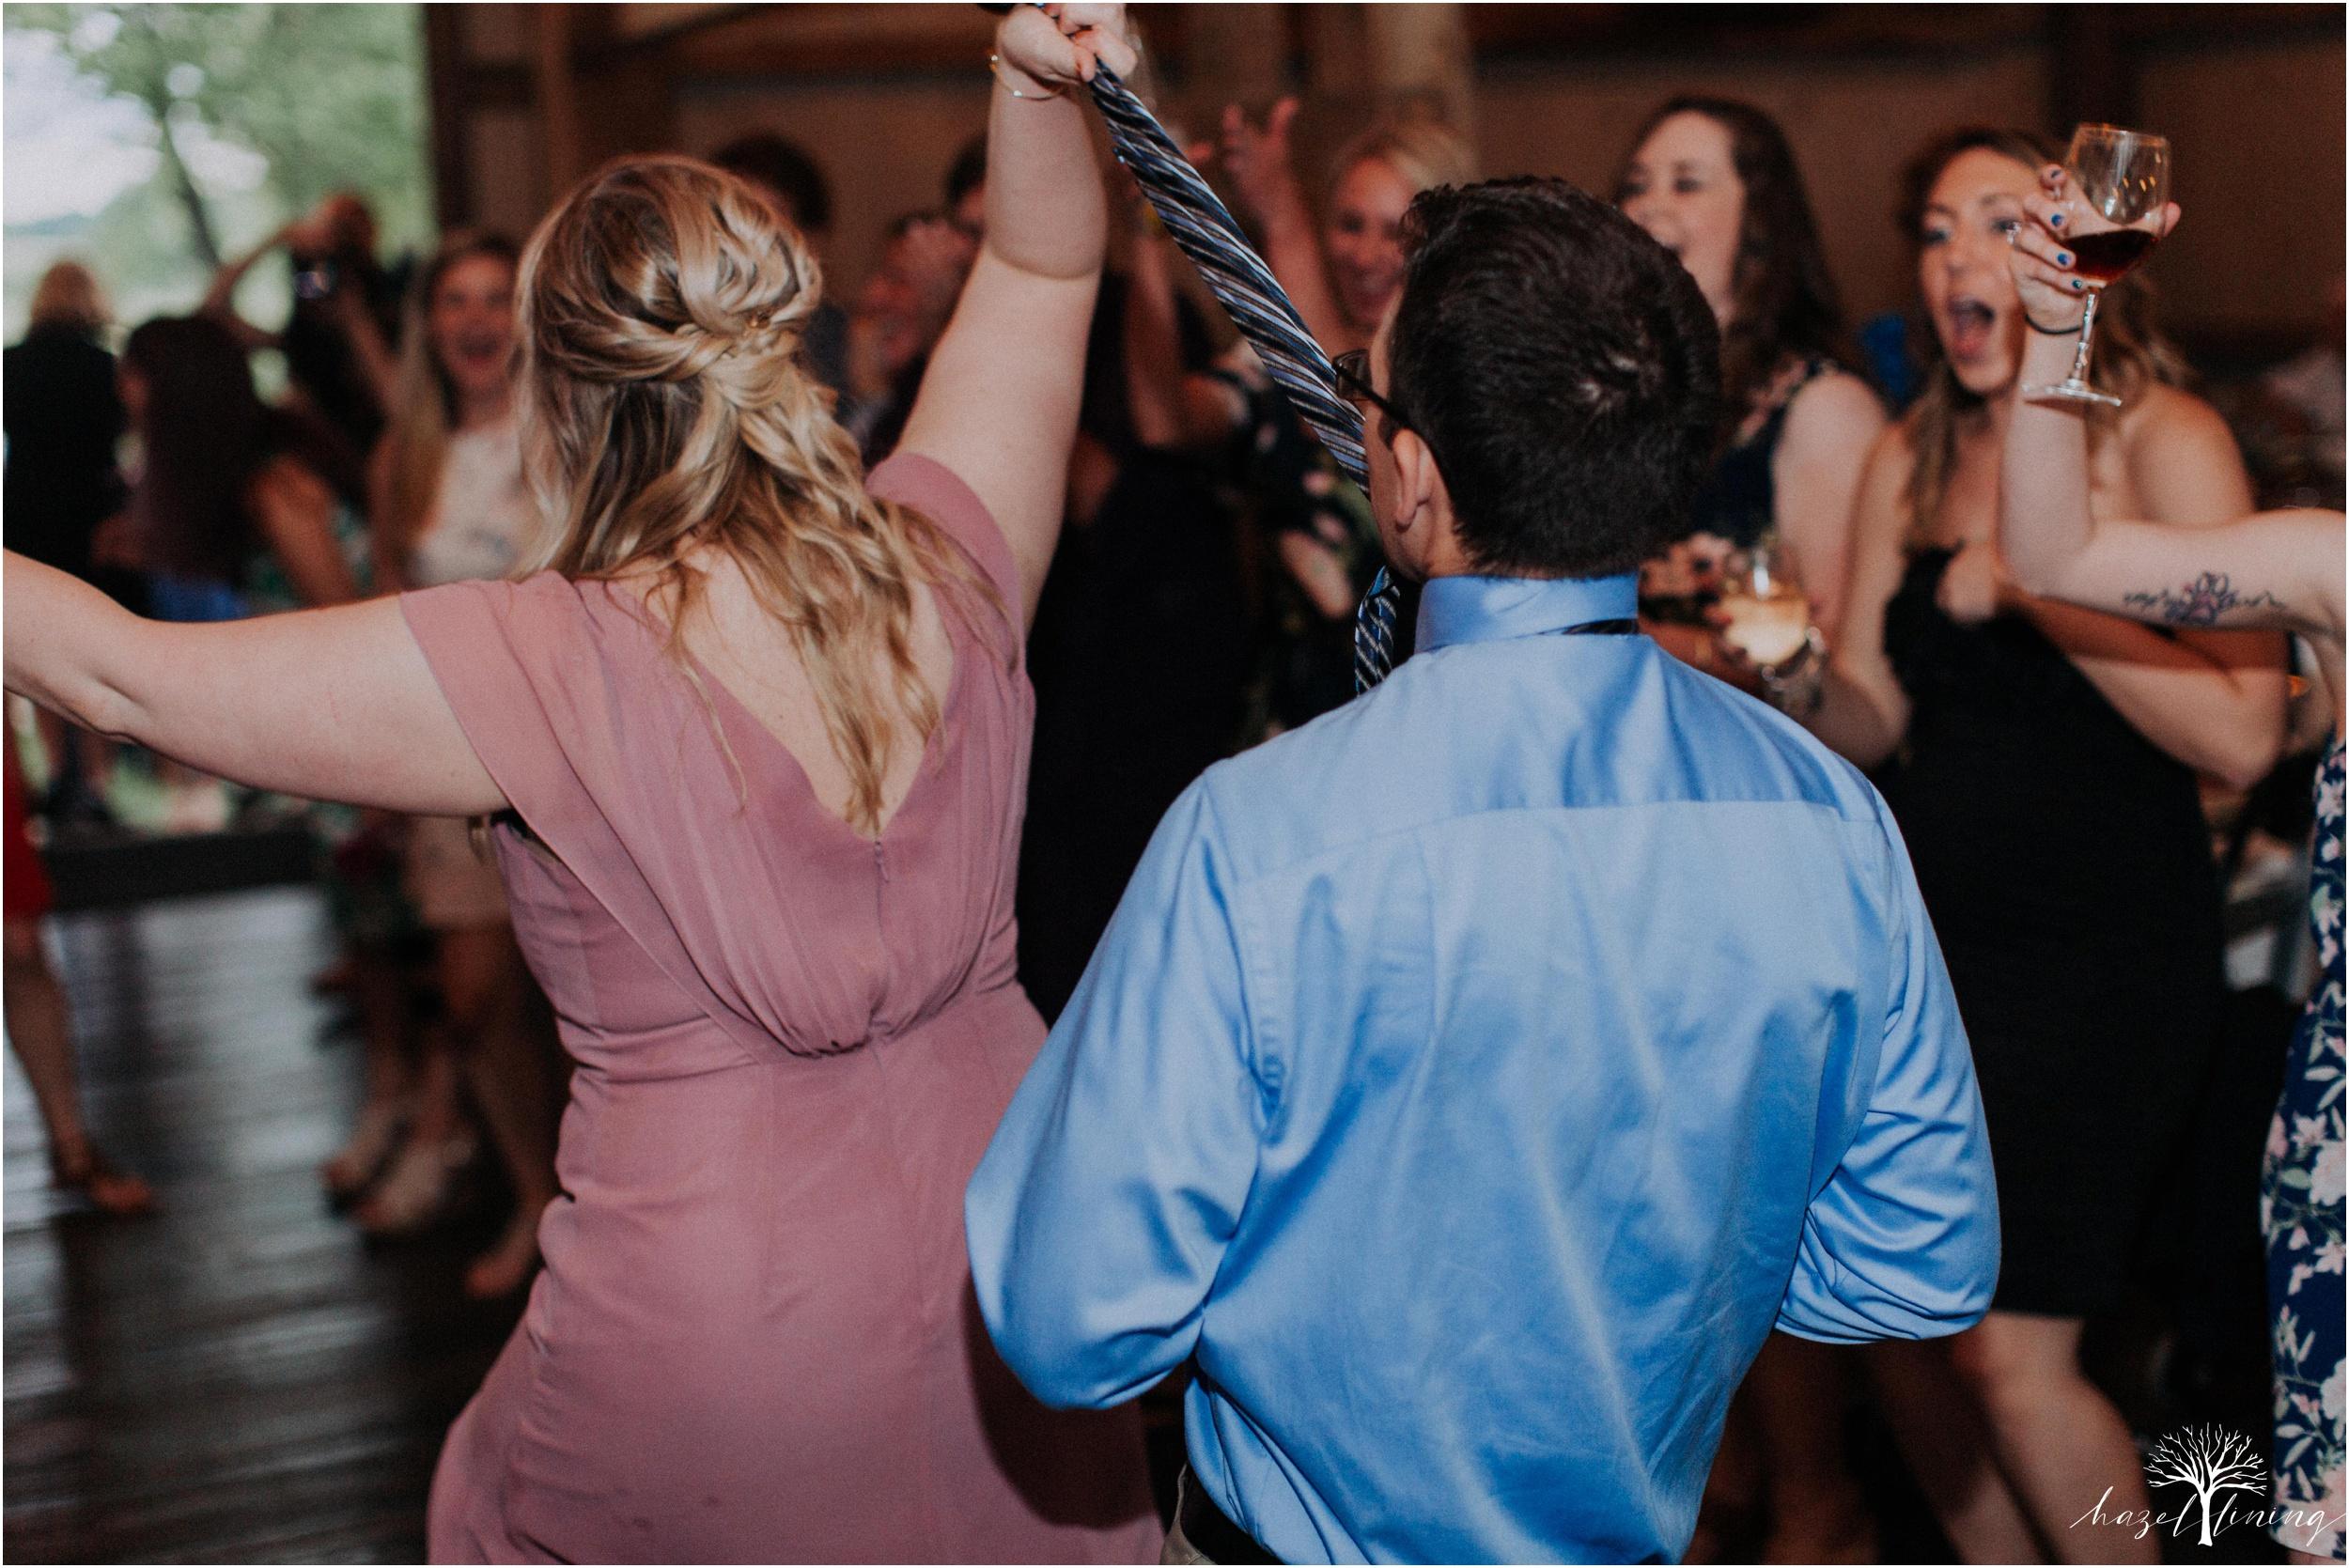 hazel-lining-travel-wedding-elopement-photography-lisa-landon-shoemaker-the-farm-bakery-and-events-bucks-county-quakertown-pennsylvania-summer-country-outdoor-farm-wedding_0156.jpg